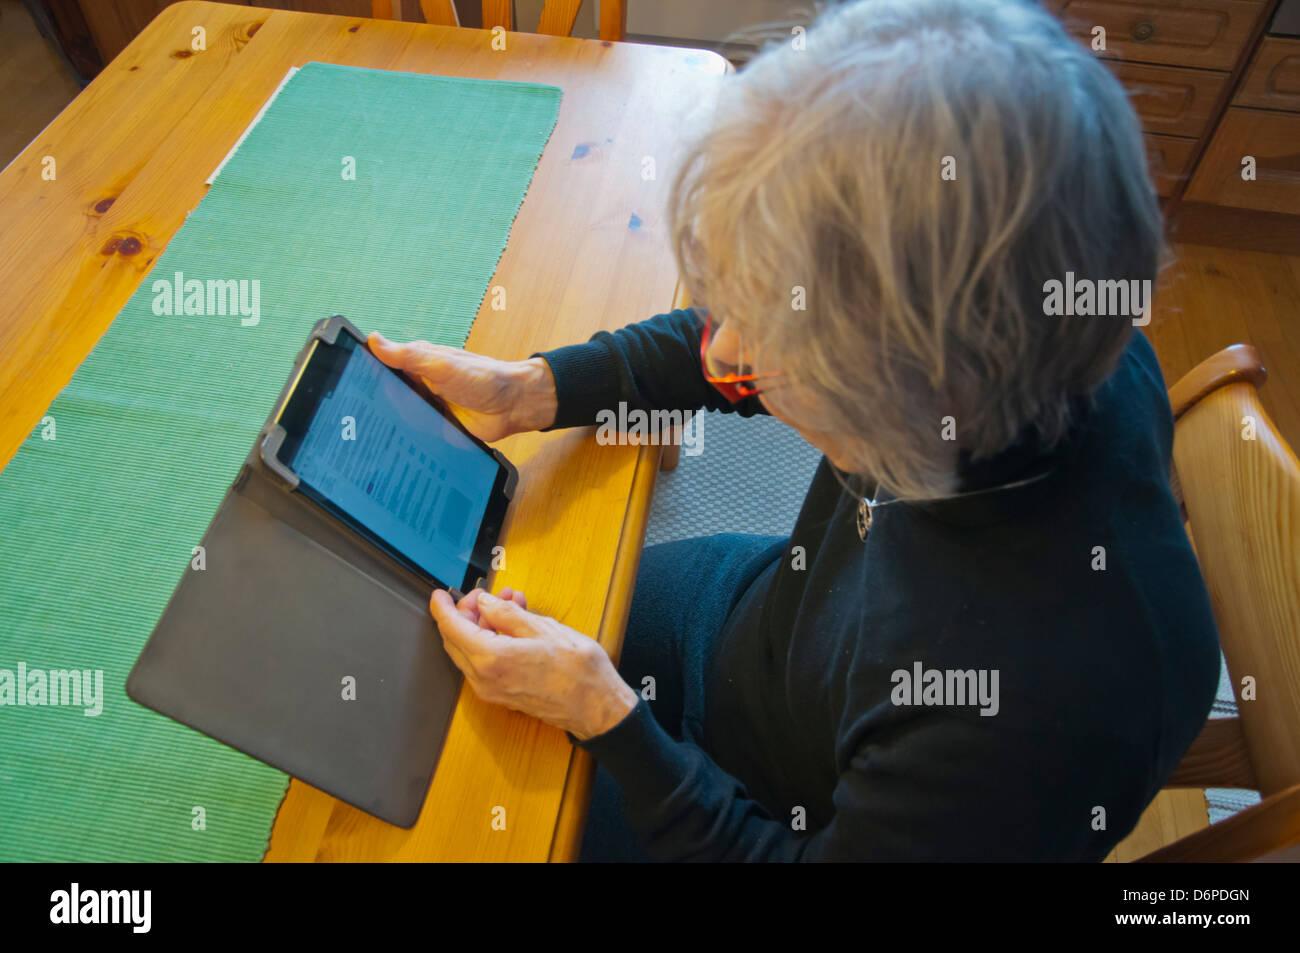 Mujer en sus primeros 70s usa mini ipad Pori Finlandia Europa Imagen De Stock